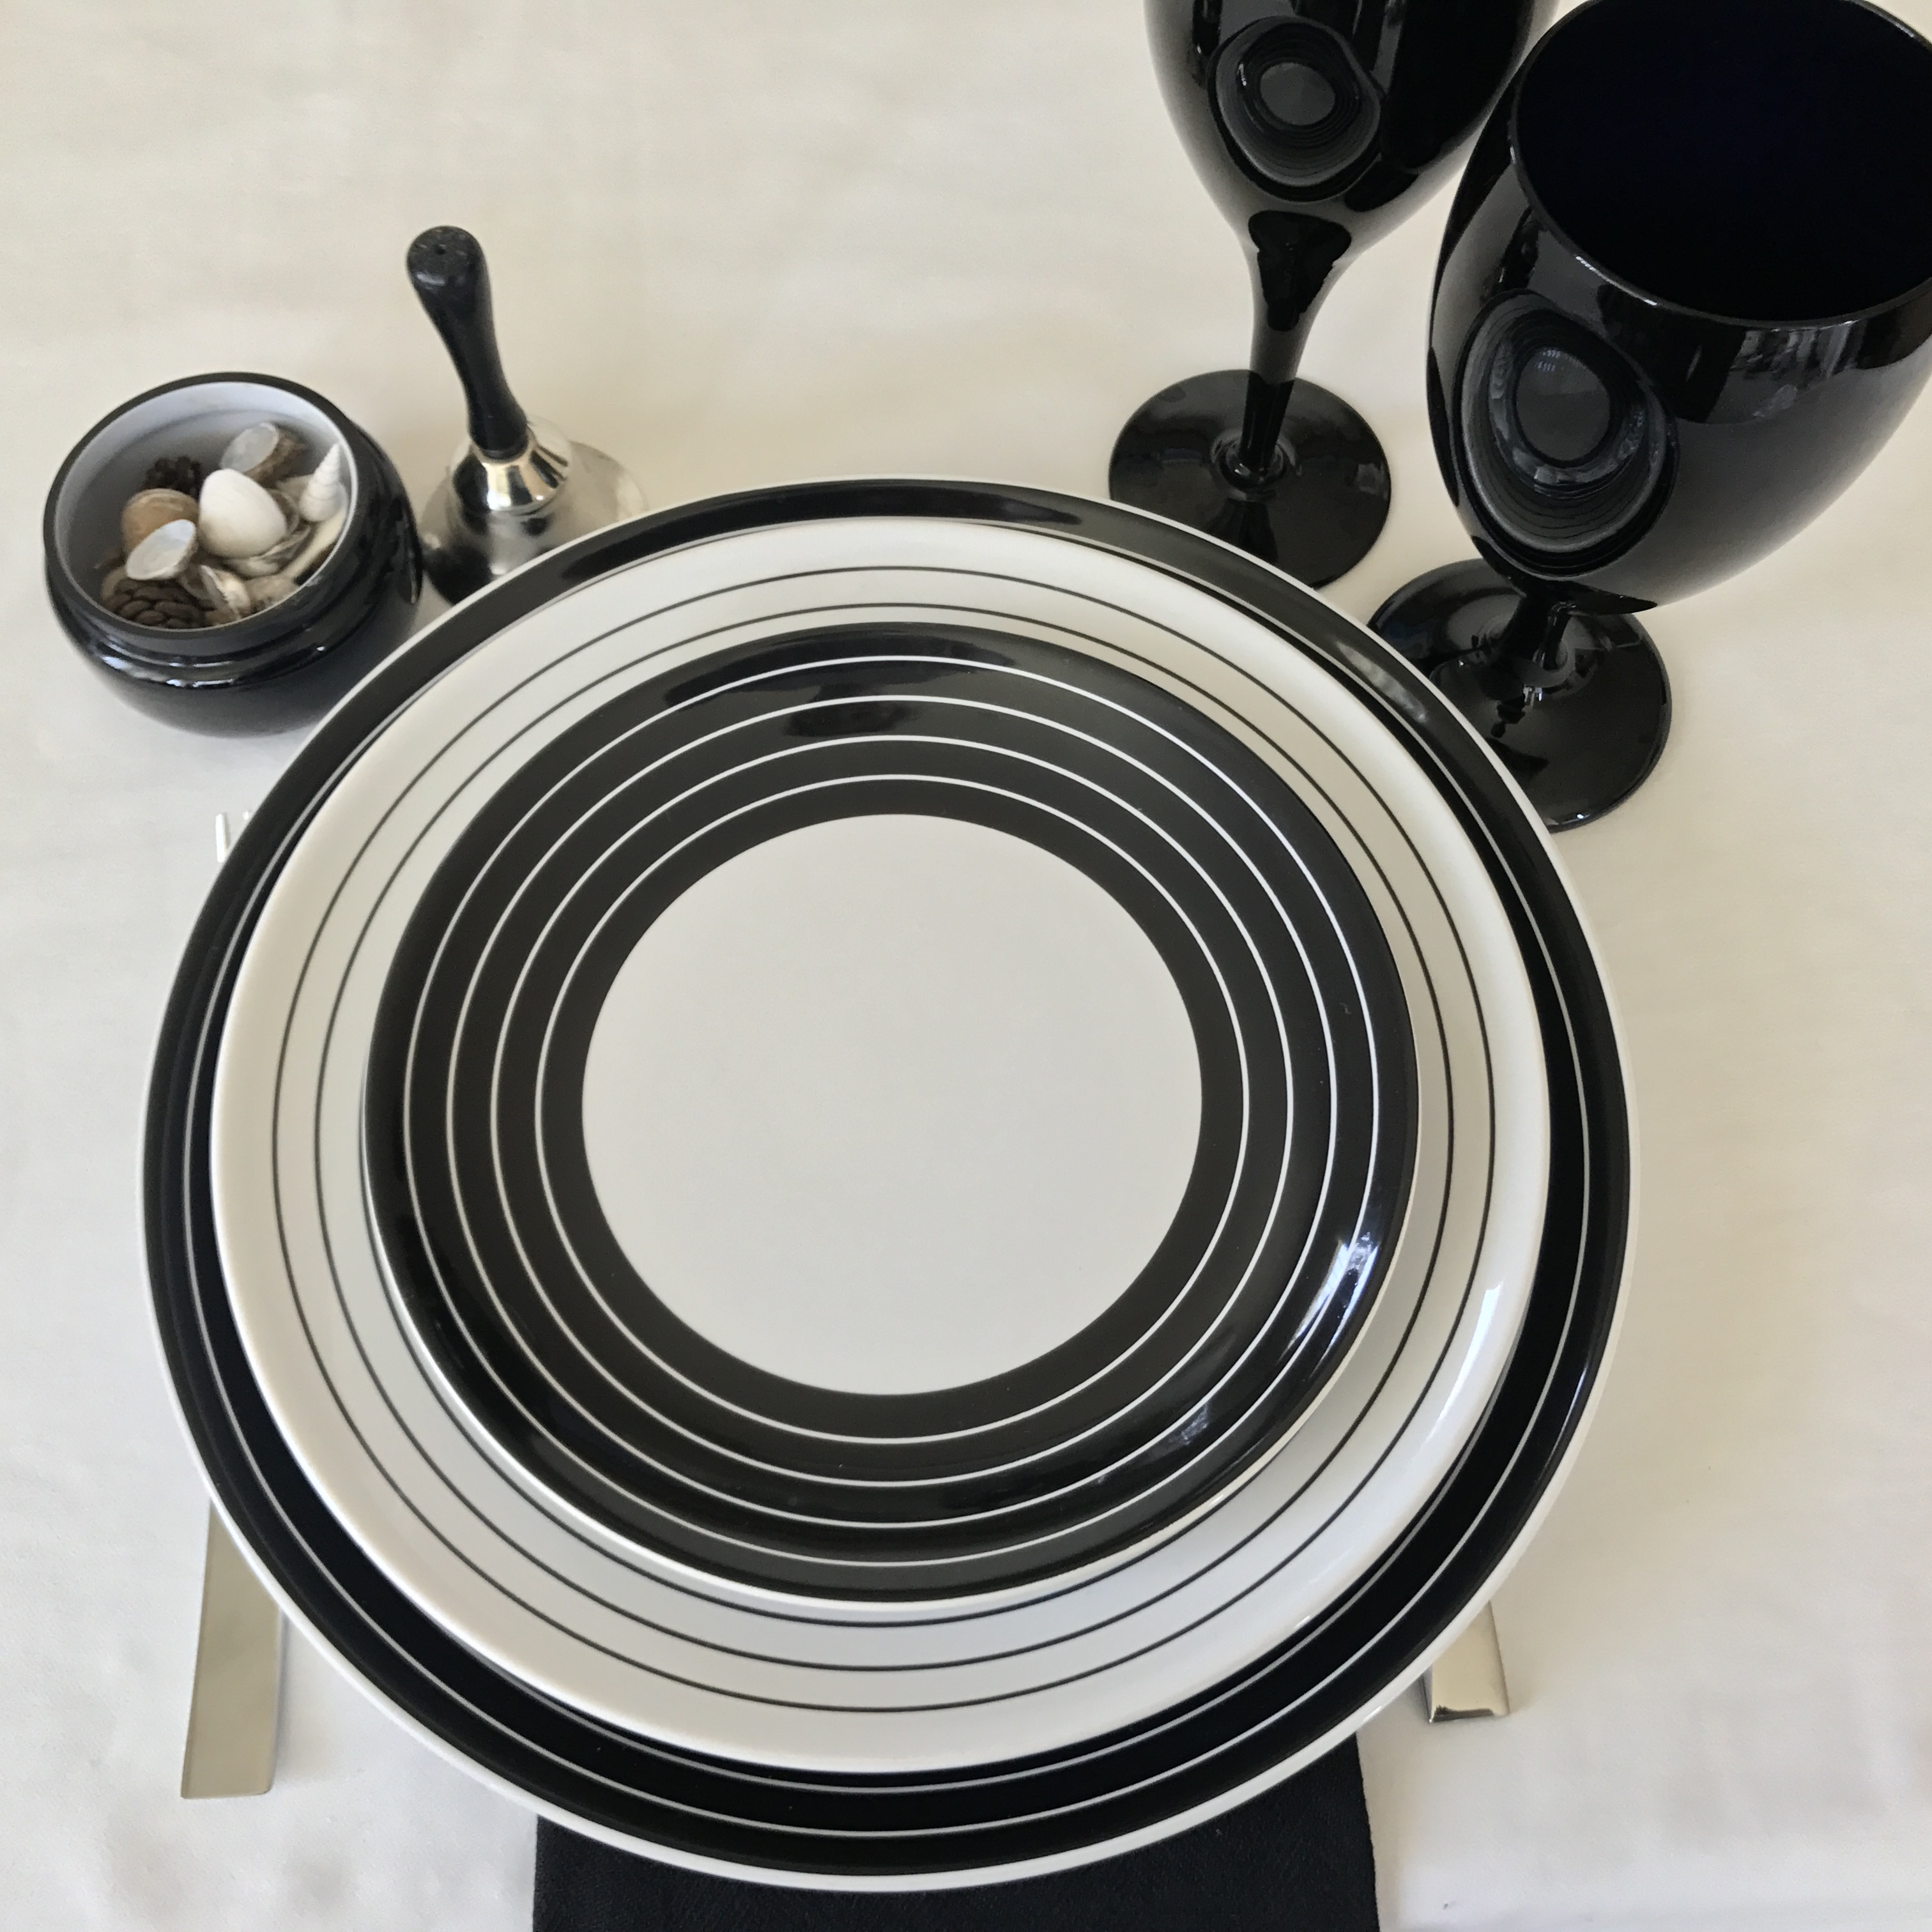 Tabletop Tuesday: Black + White Swirl